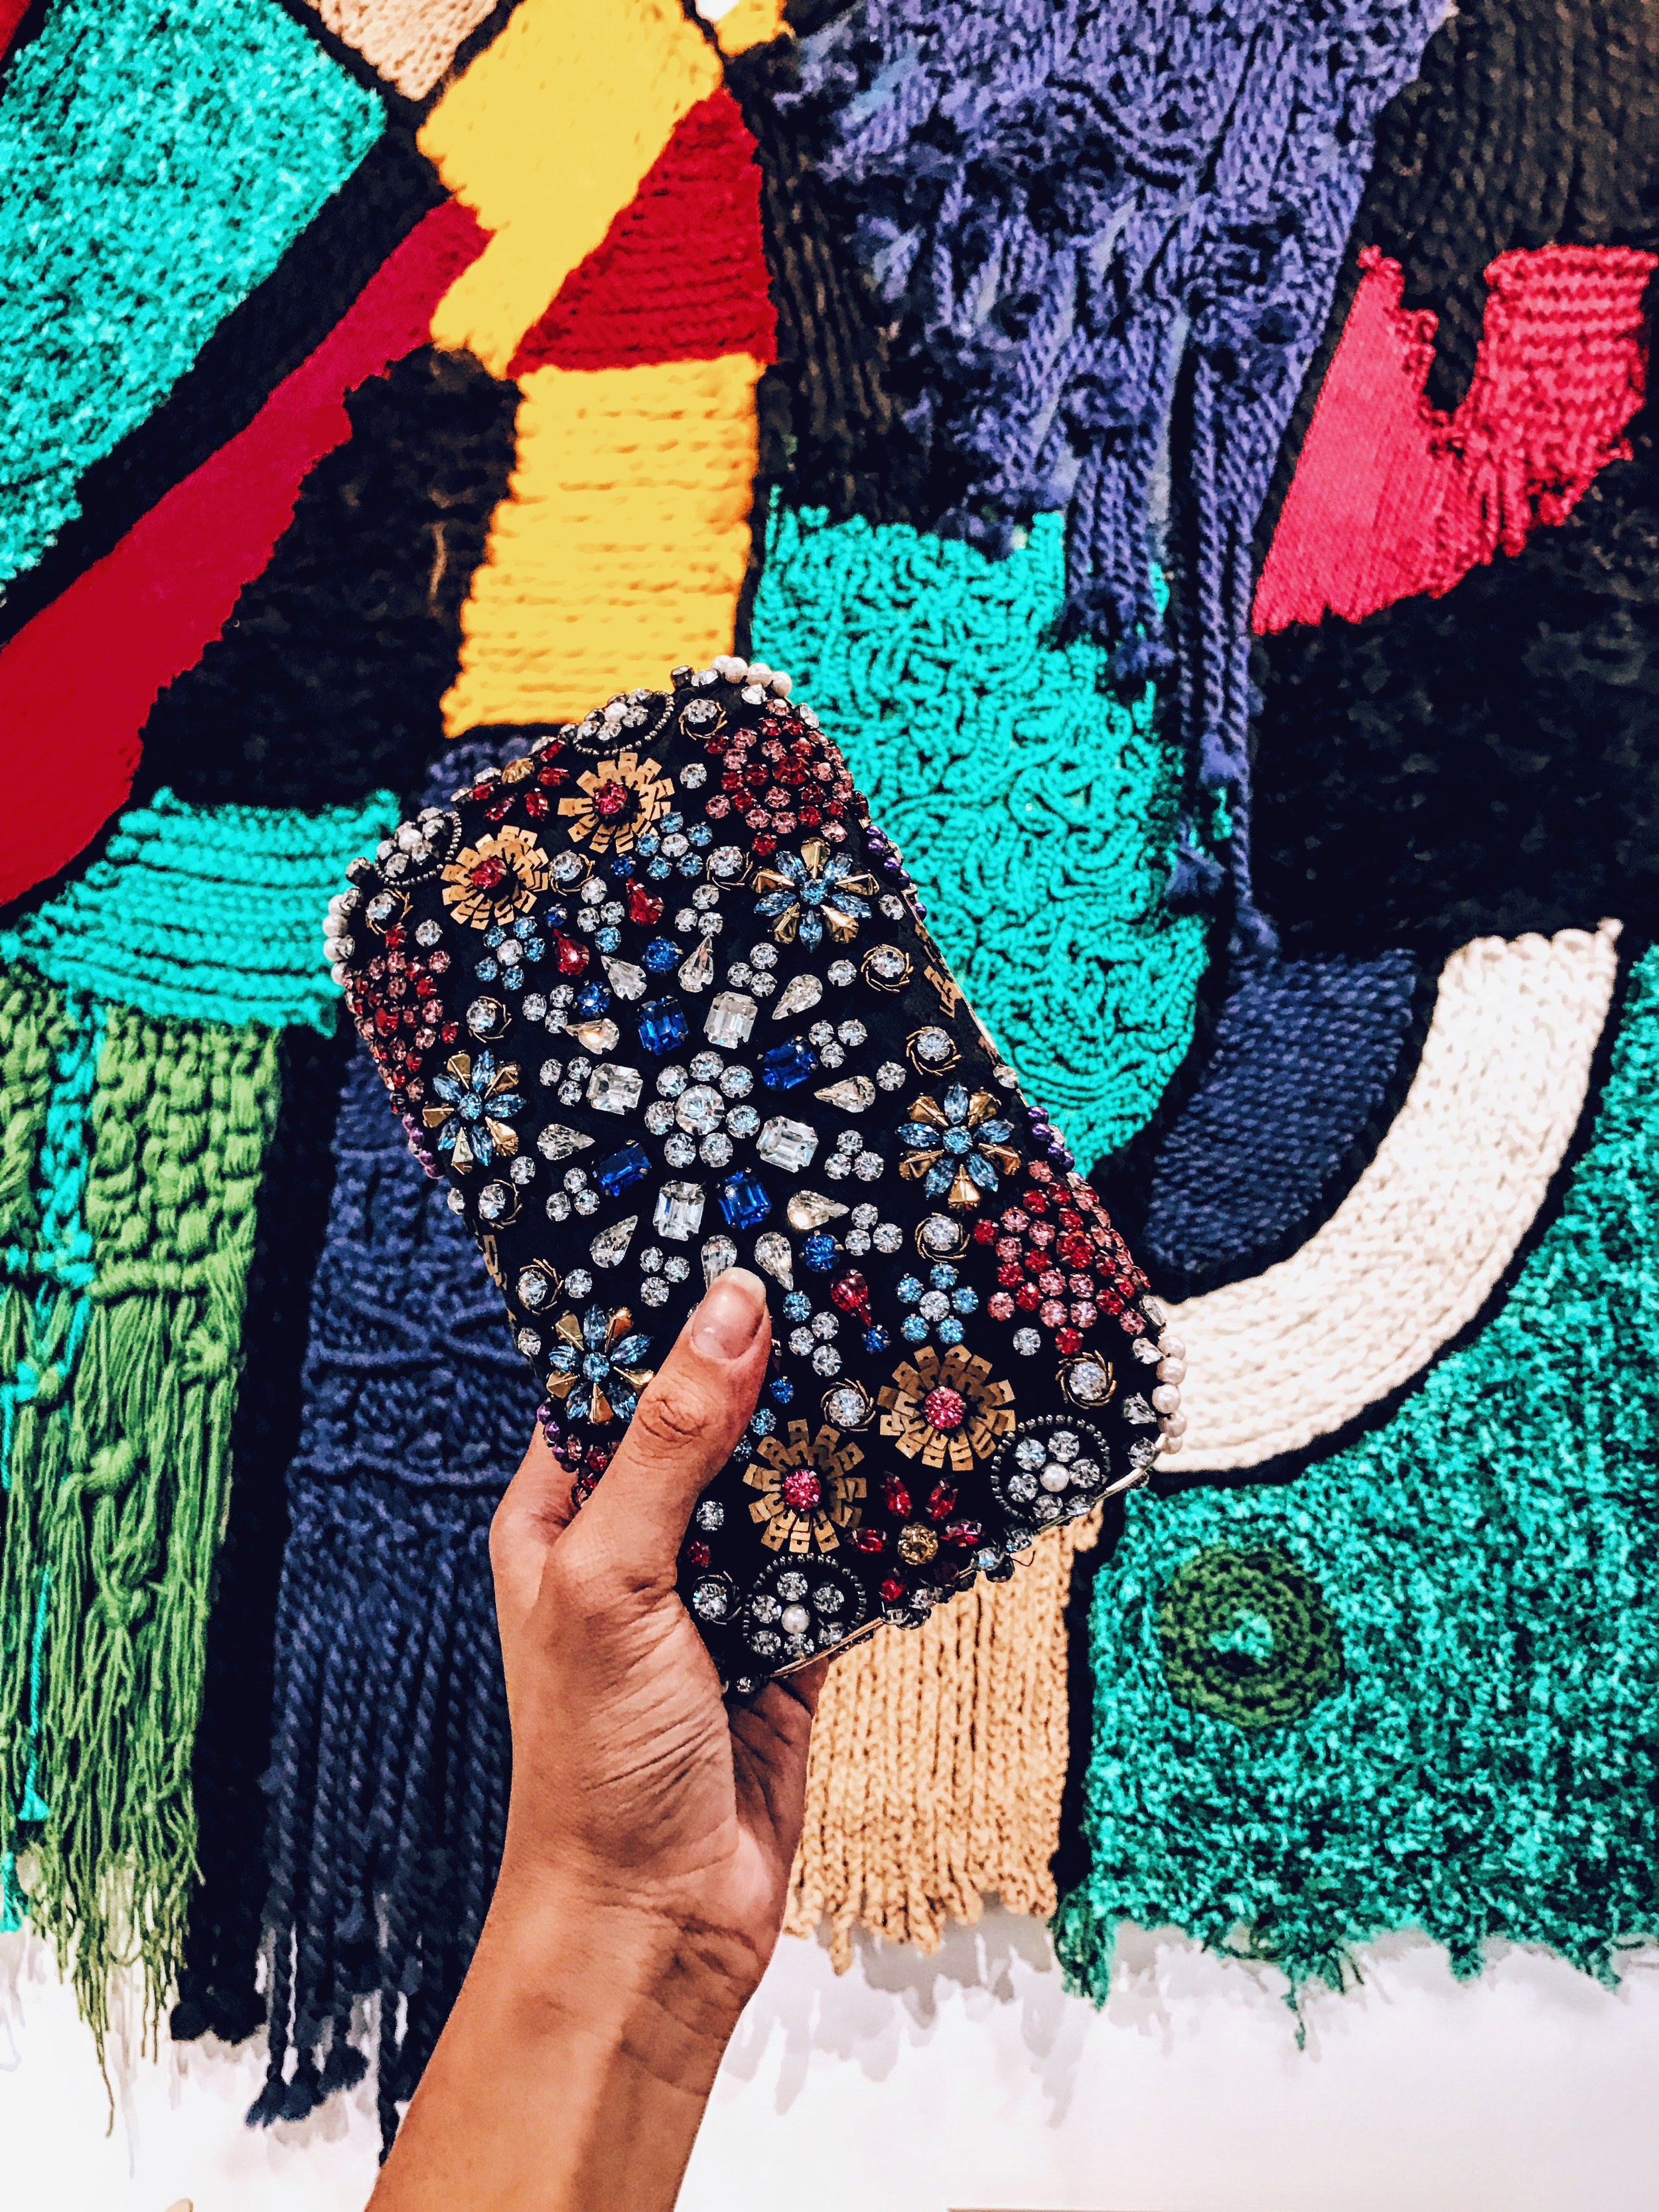 miami-fashion-stylist-portfolio-blogger-illy-perez-house-of-she11.JPG